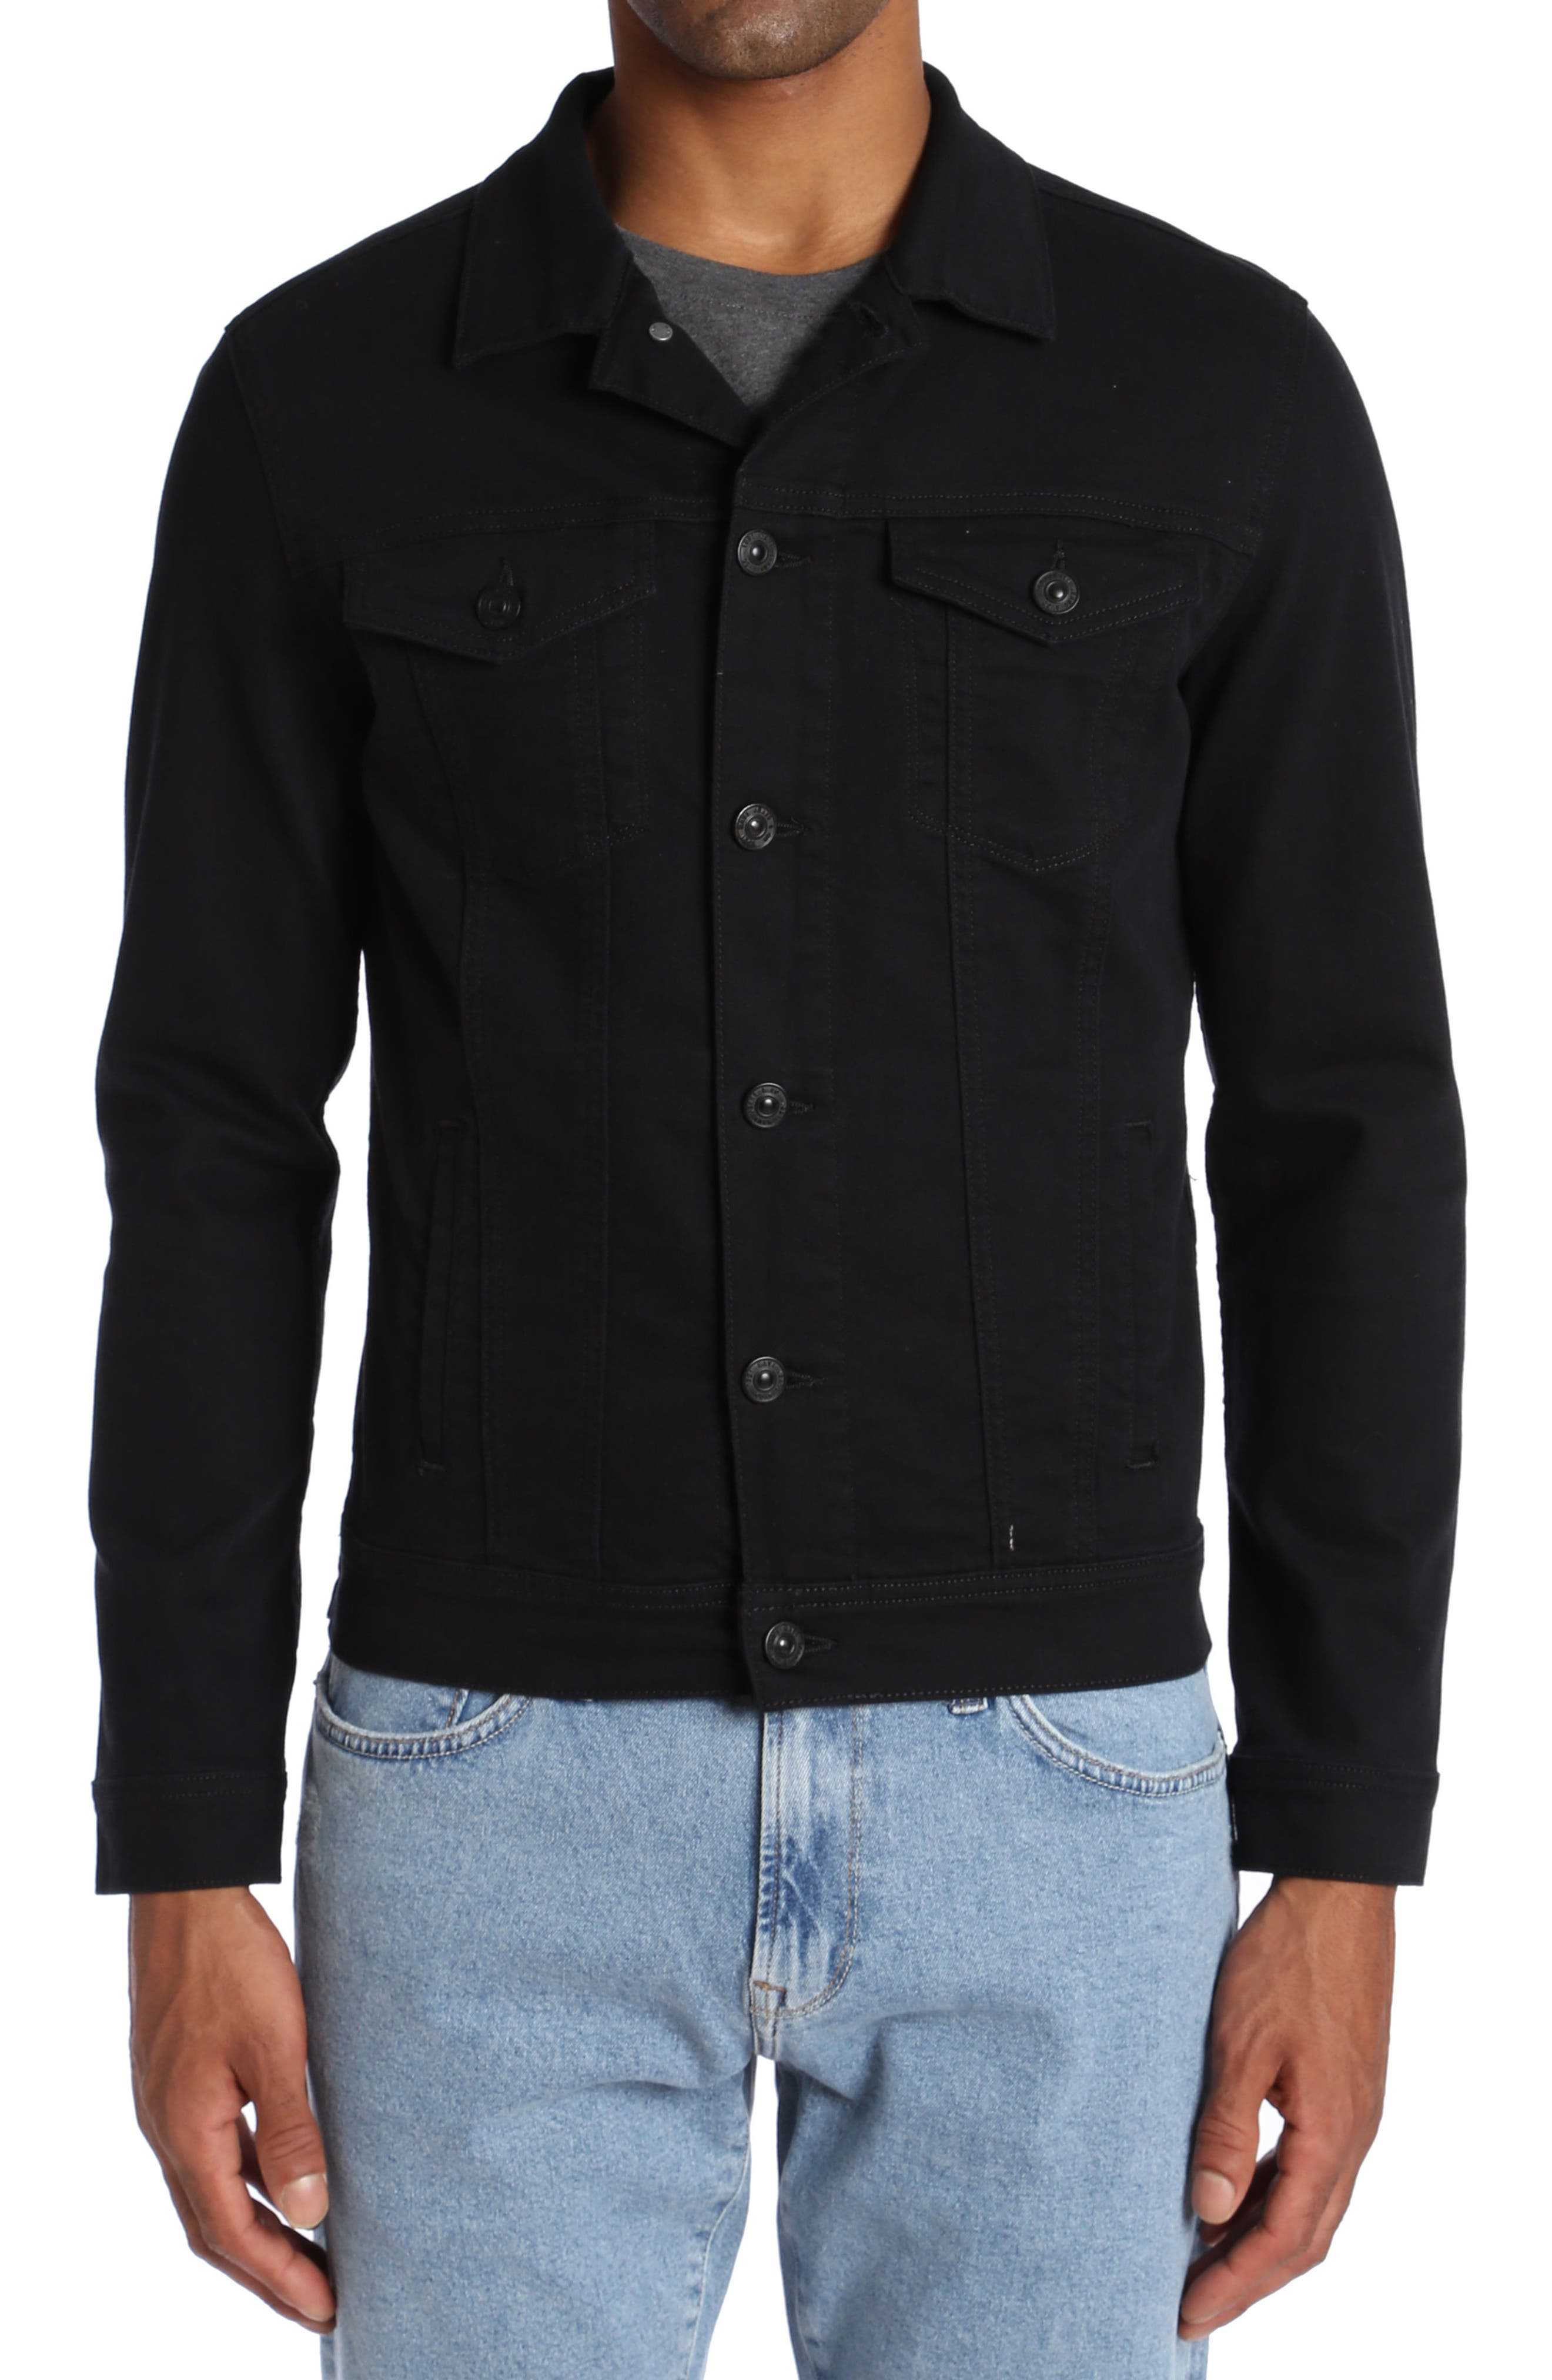 Frank Denim Jacket,                             Main thumbnail 1, color,                             Black Comfort